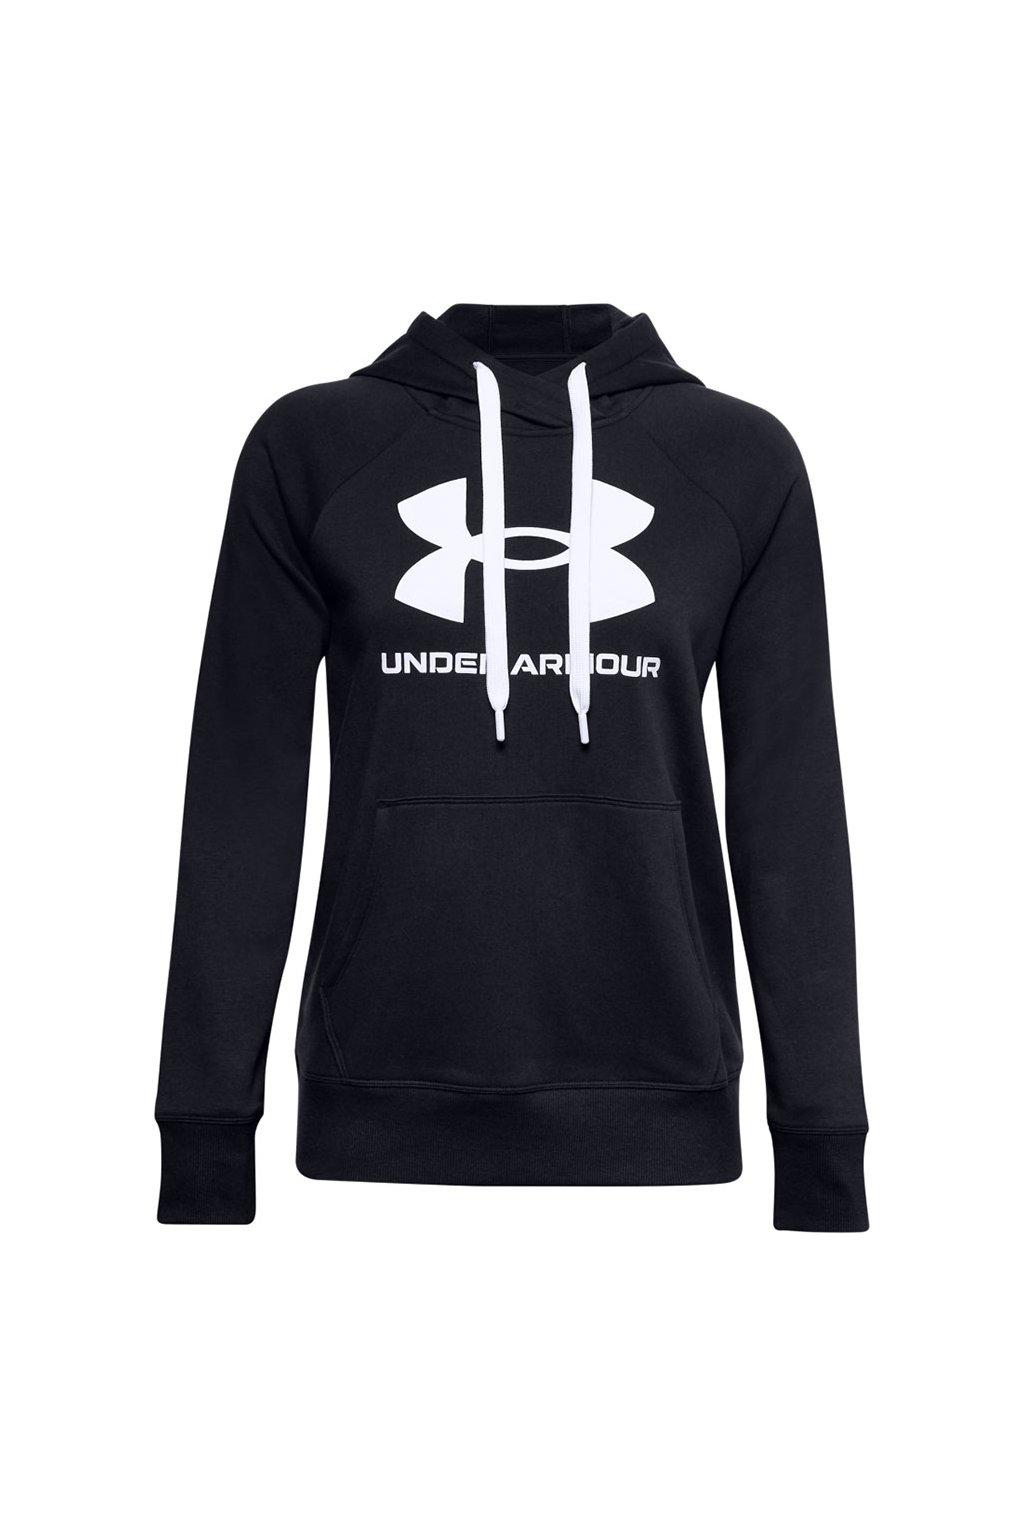 Dámska mikina Under Armour Rival Fleece Logo Hoodie čierna 1356318 001